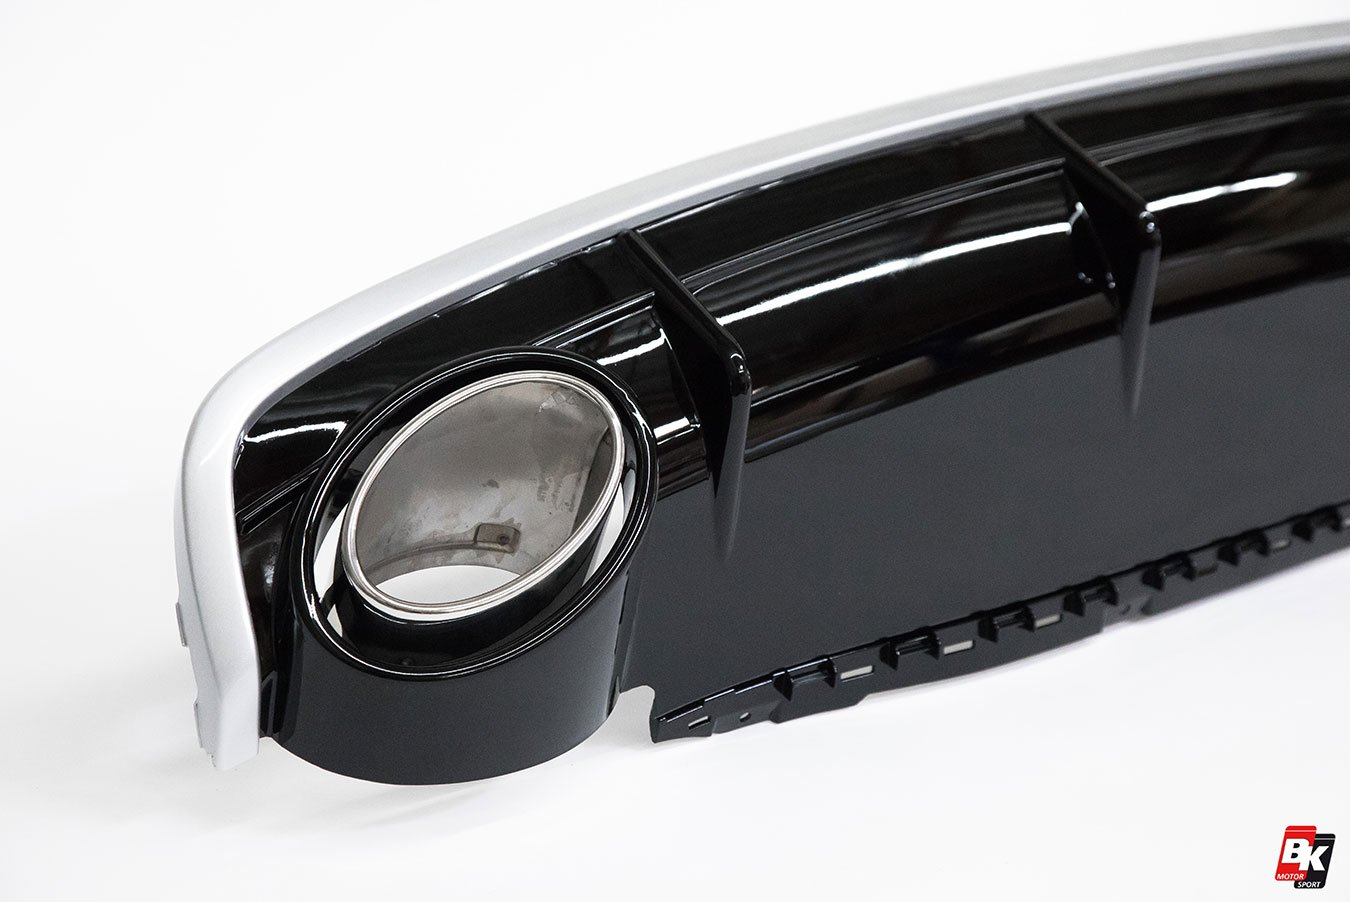 BKM Rear Diffuser (RS Style - Glossy Black), fits Audi Q7 4M